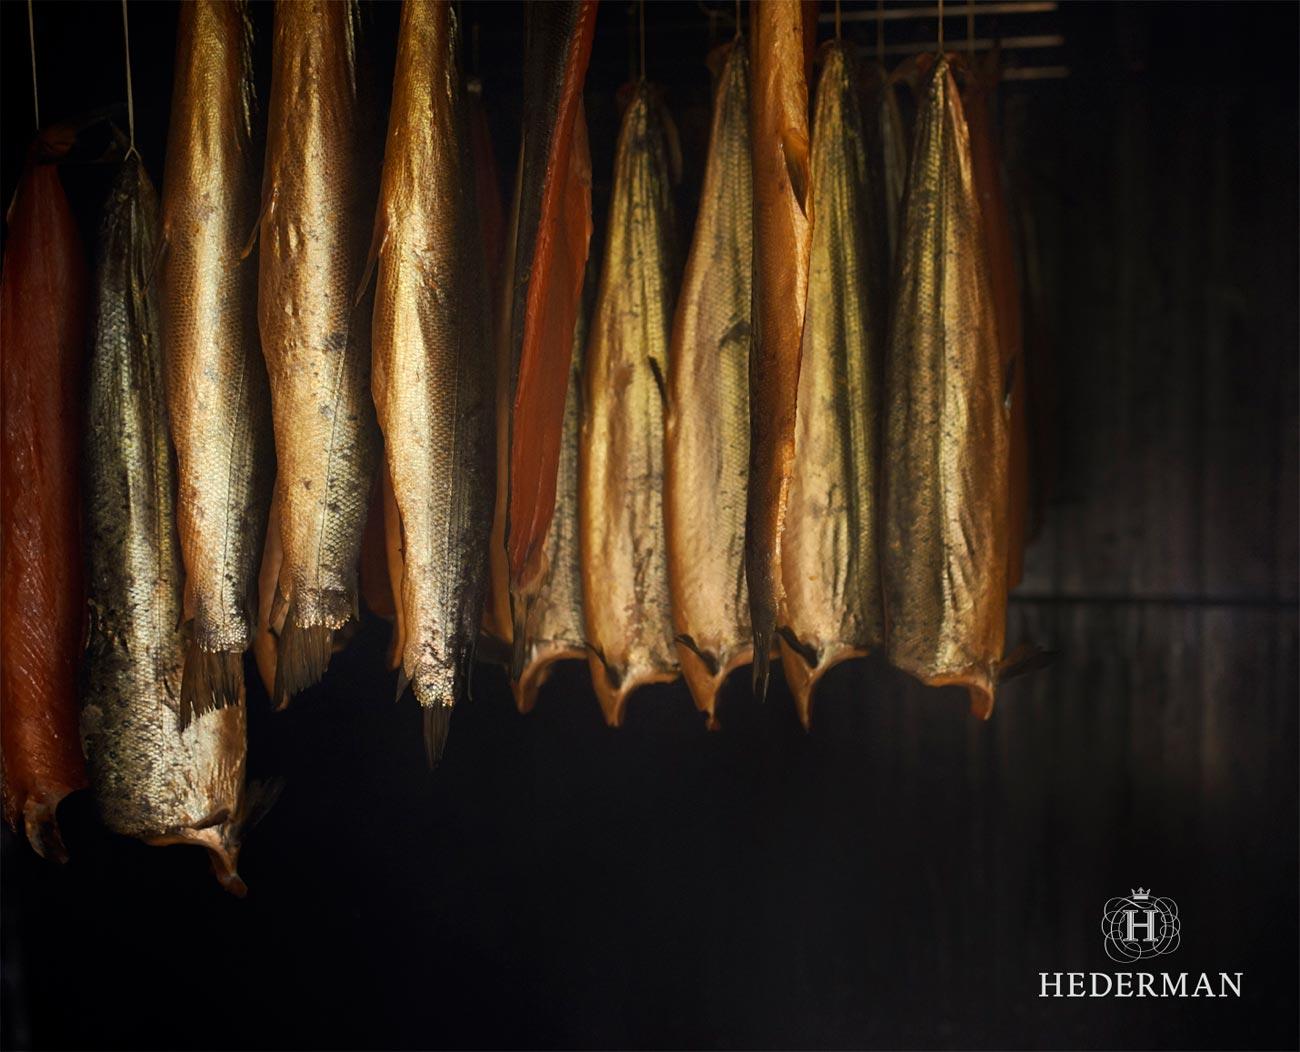 Client: Henderman Smoked Fish